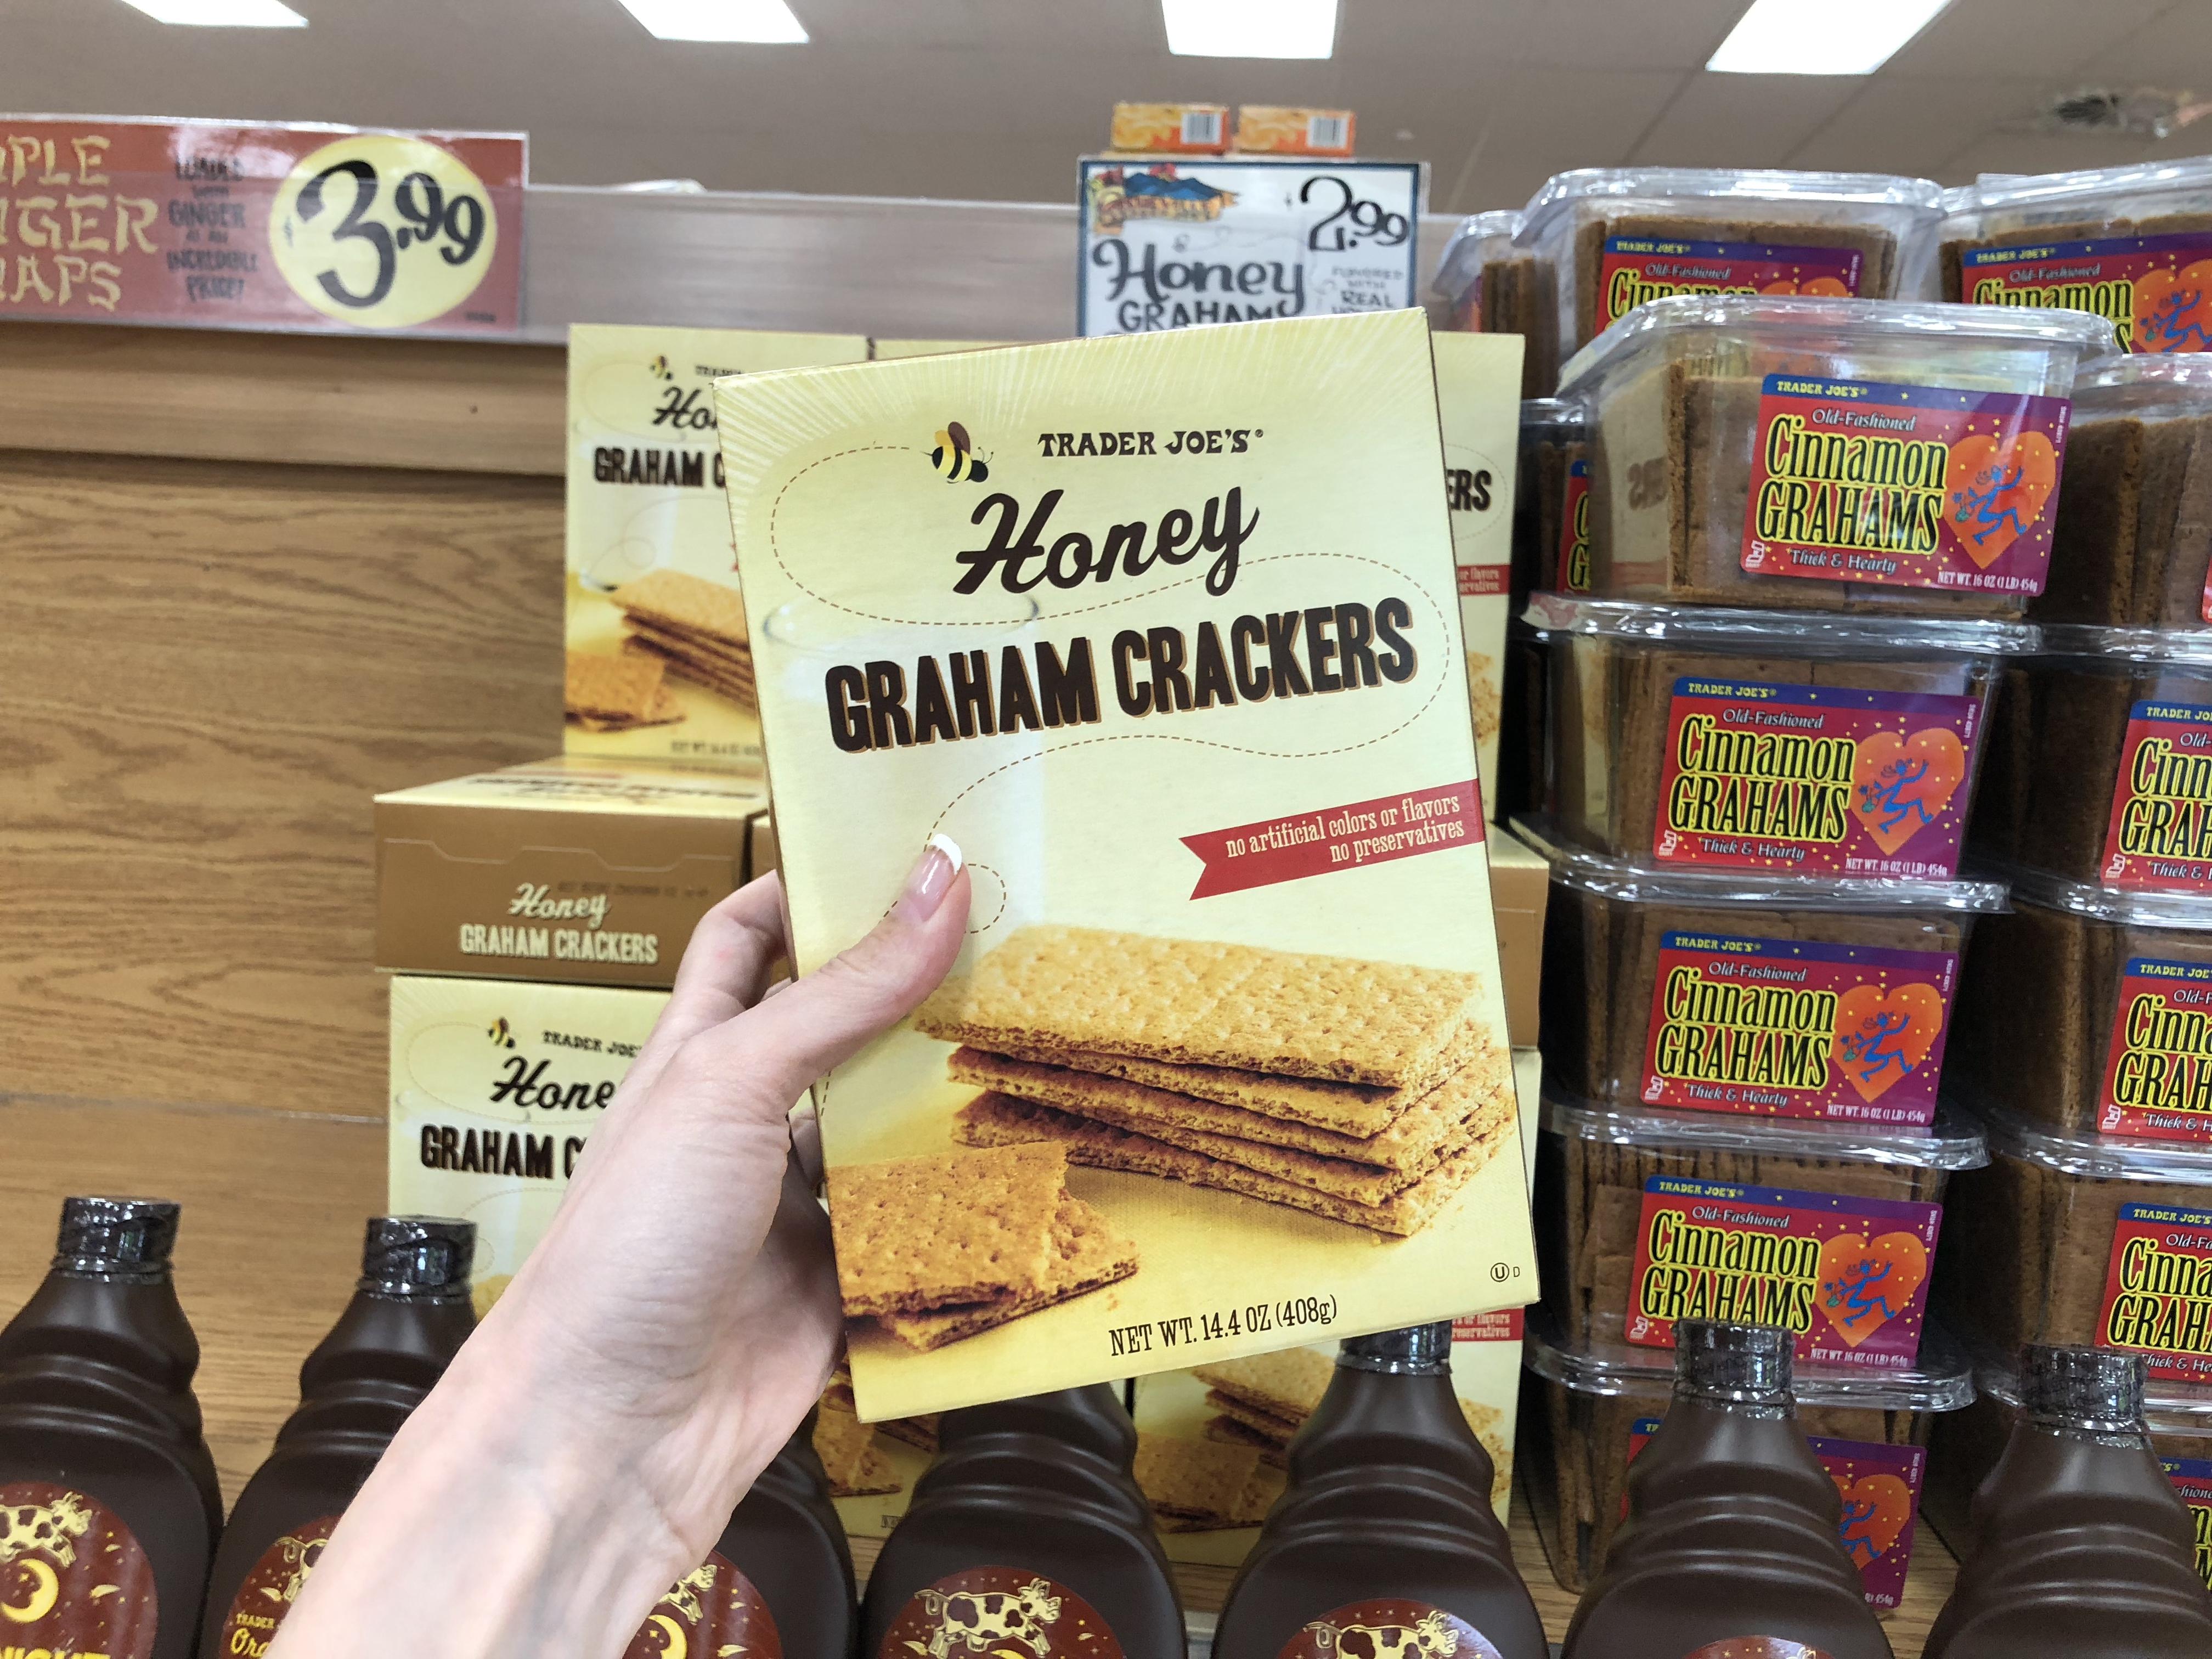 trader joes deals – honey graham crackers